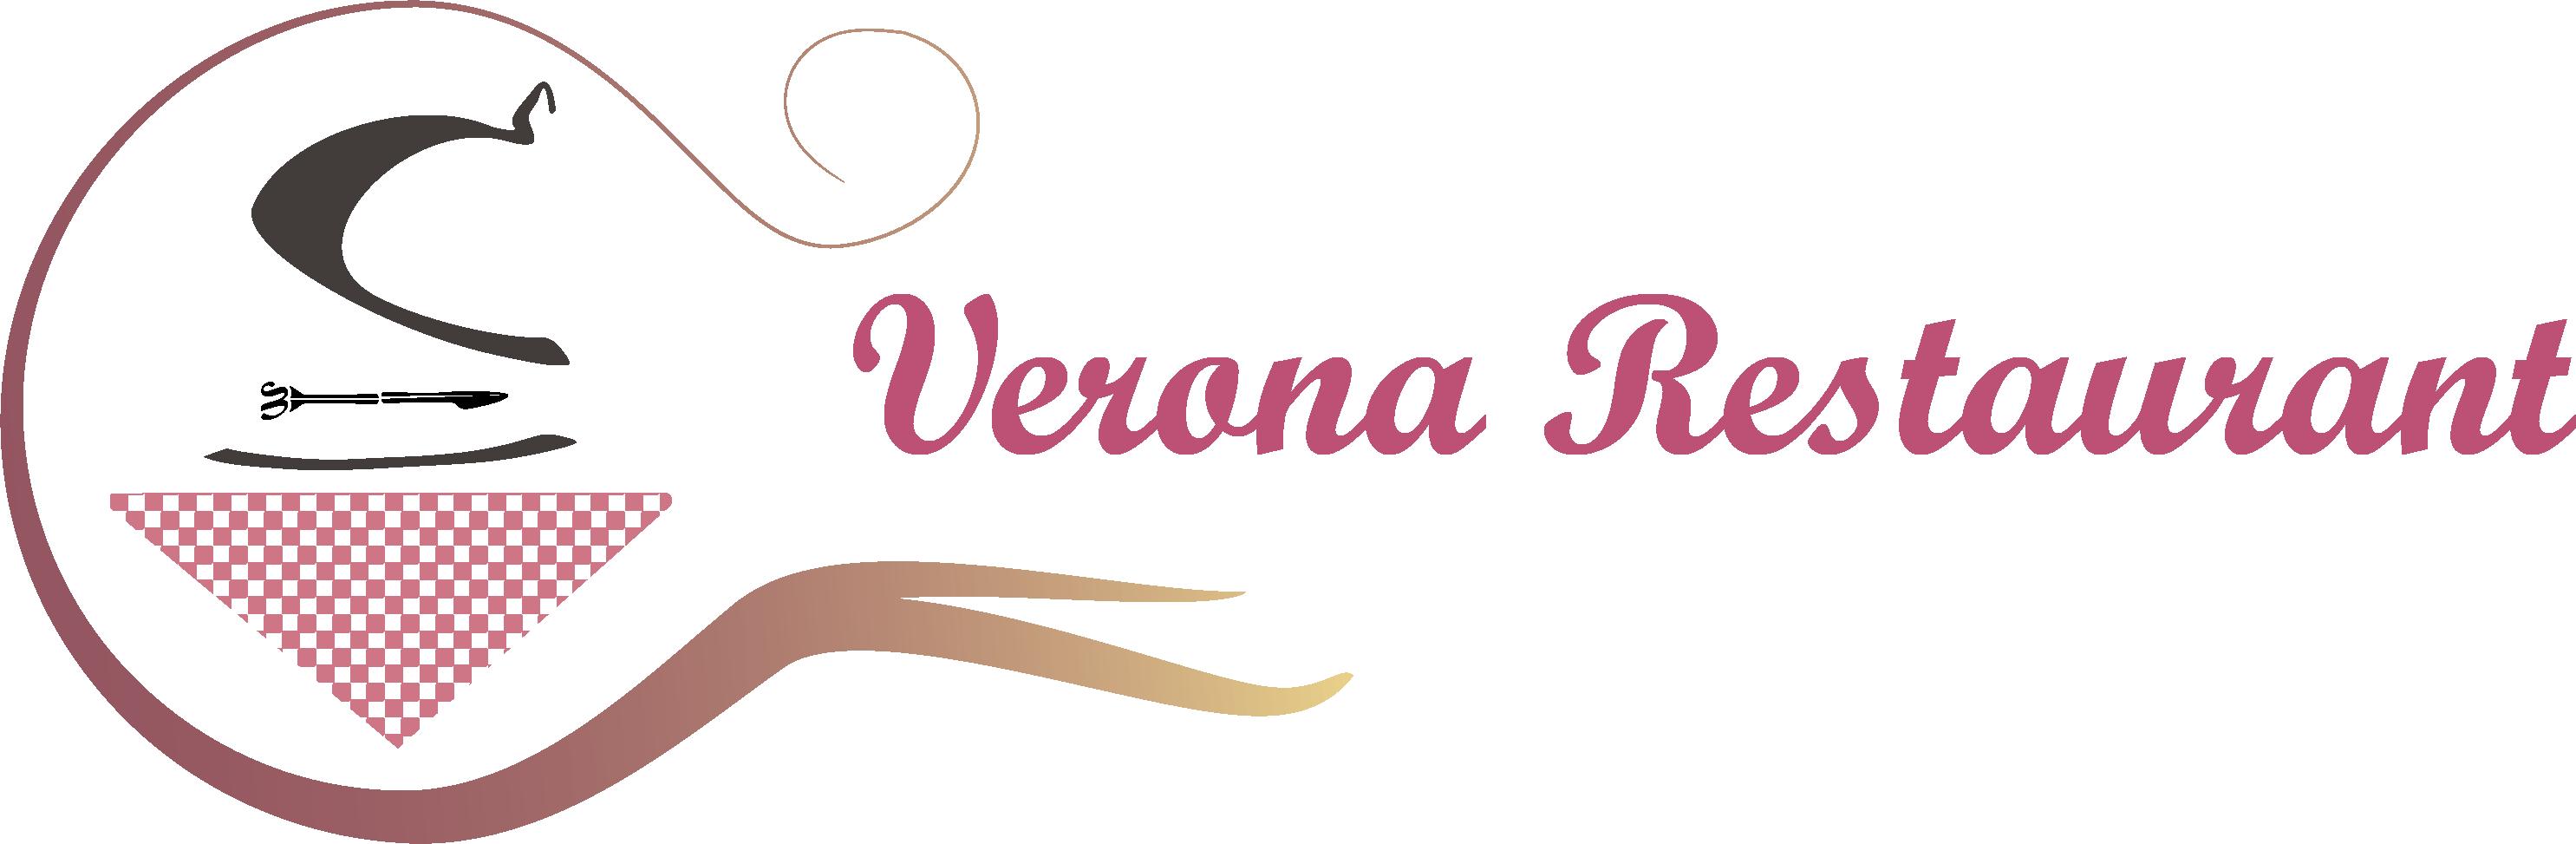 VeronaRestaurantLOGO